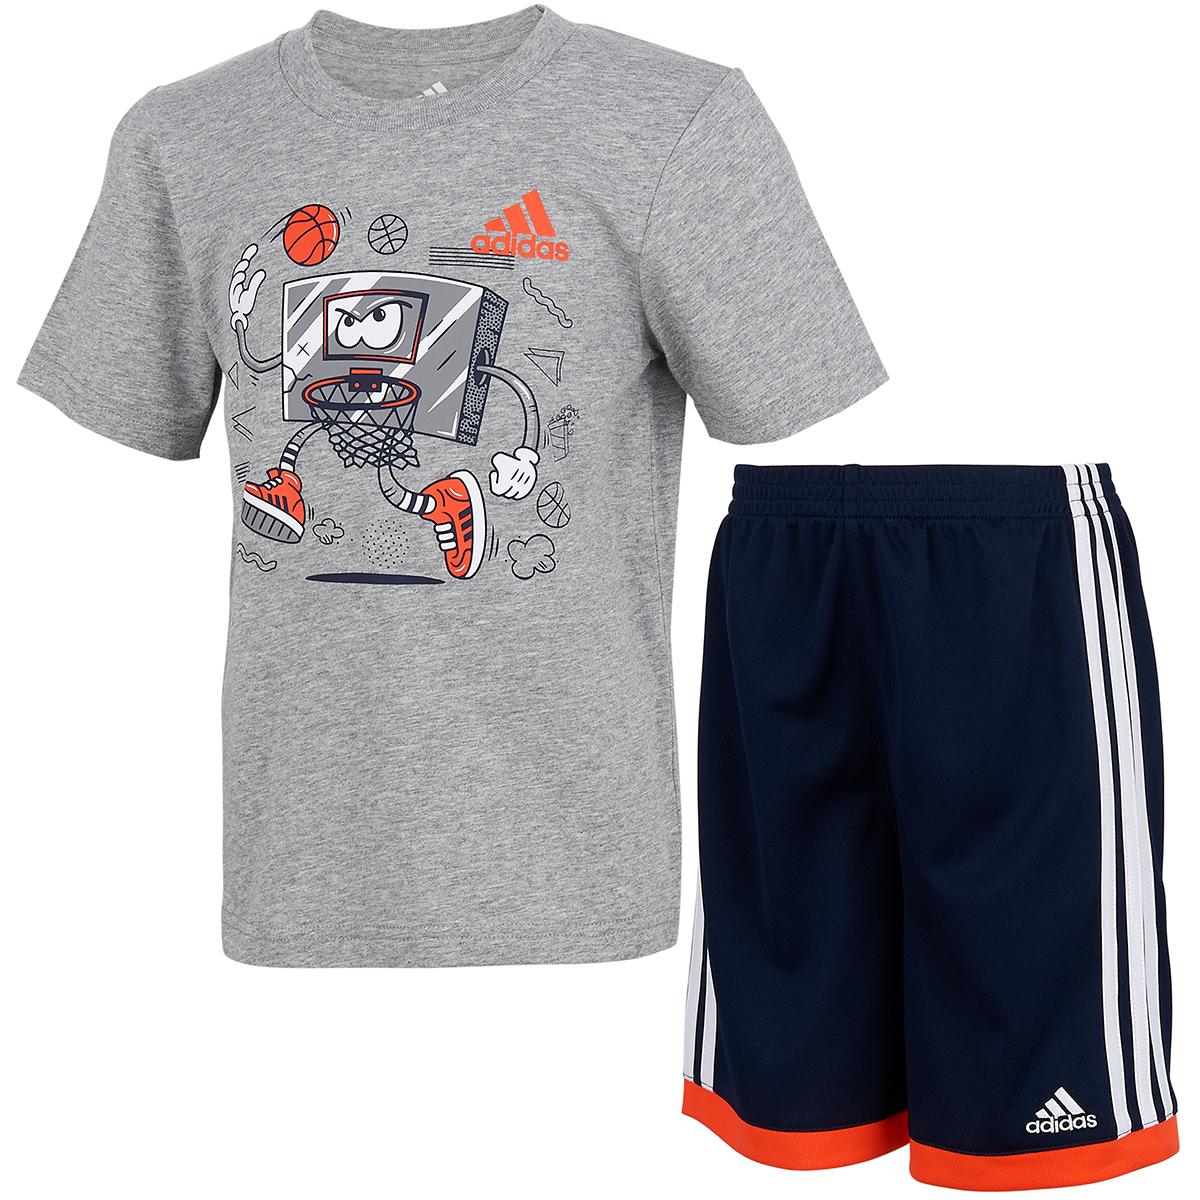 Adidas Little Boys' Graphic T-Shirt And Shorts Set - Black, 7